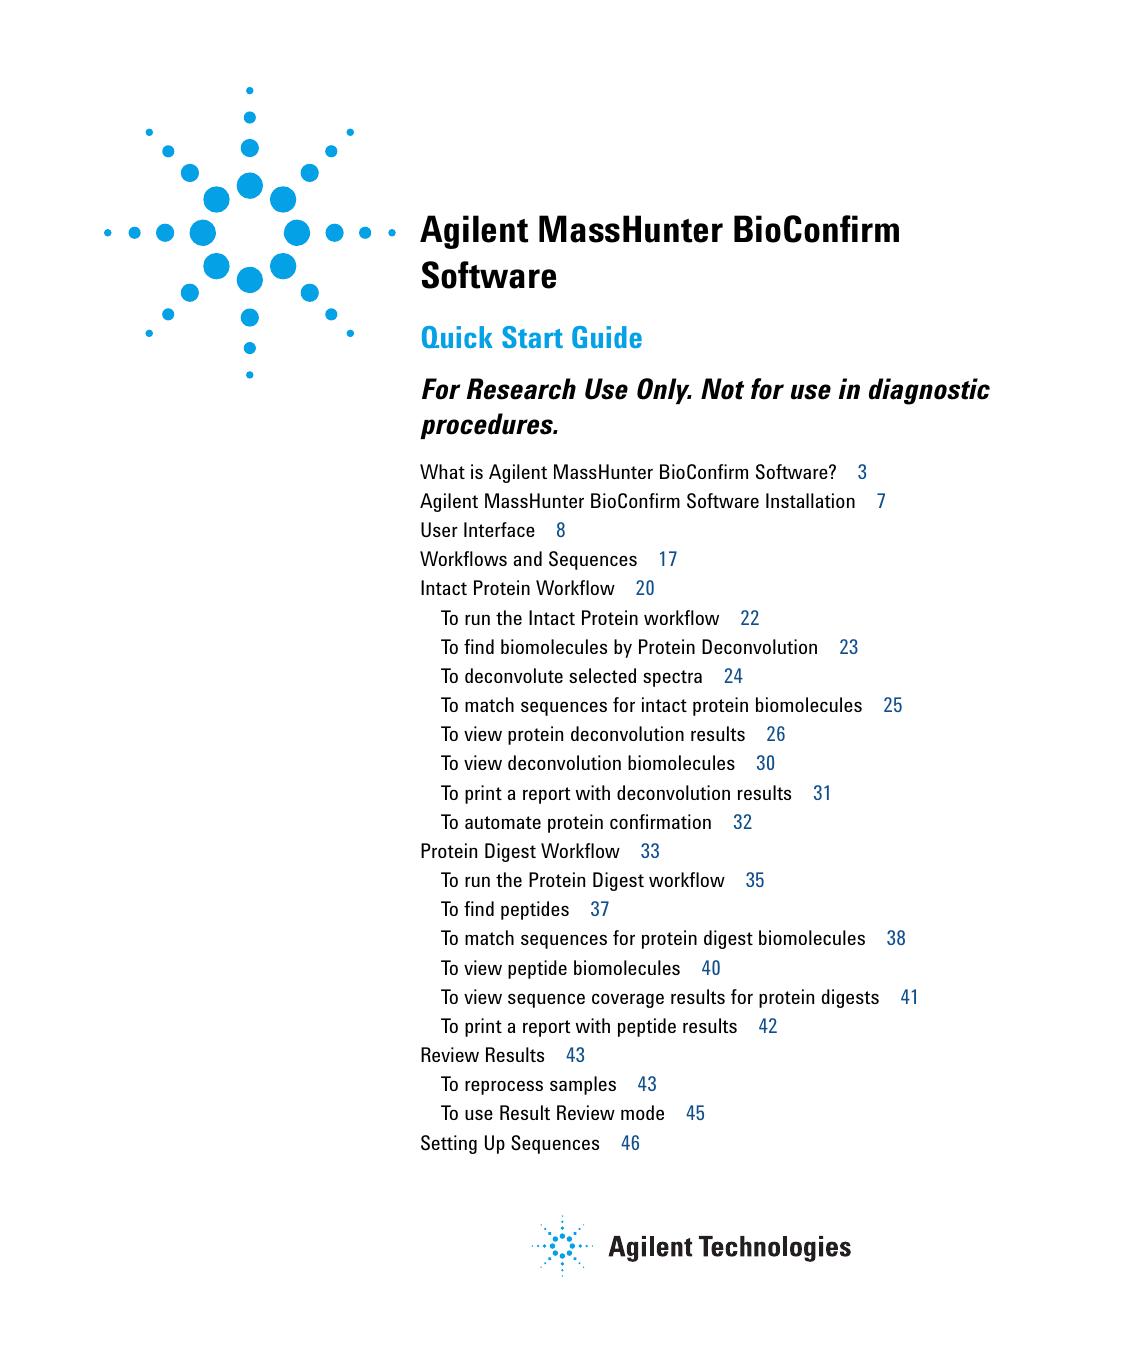 Agilent MassHunter BioConfirm Software | manualzz com